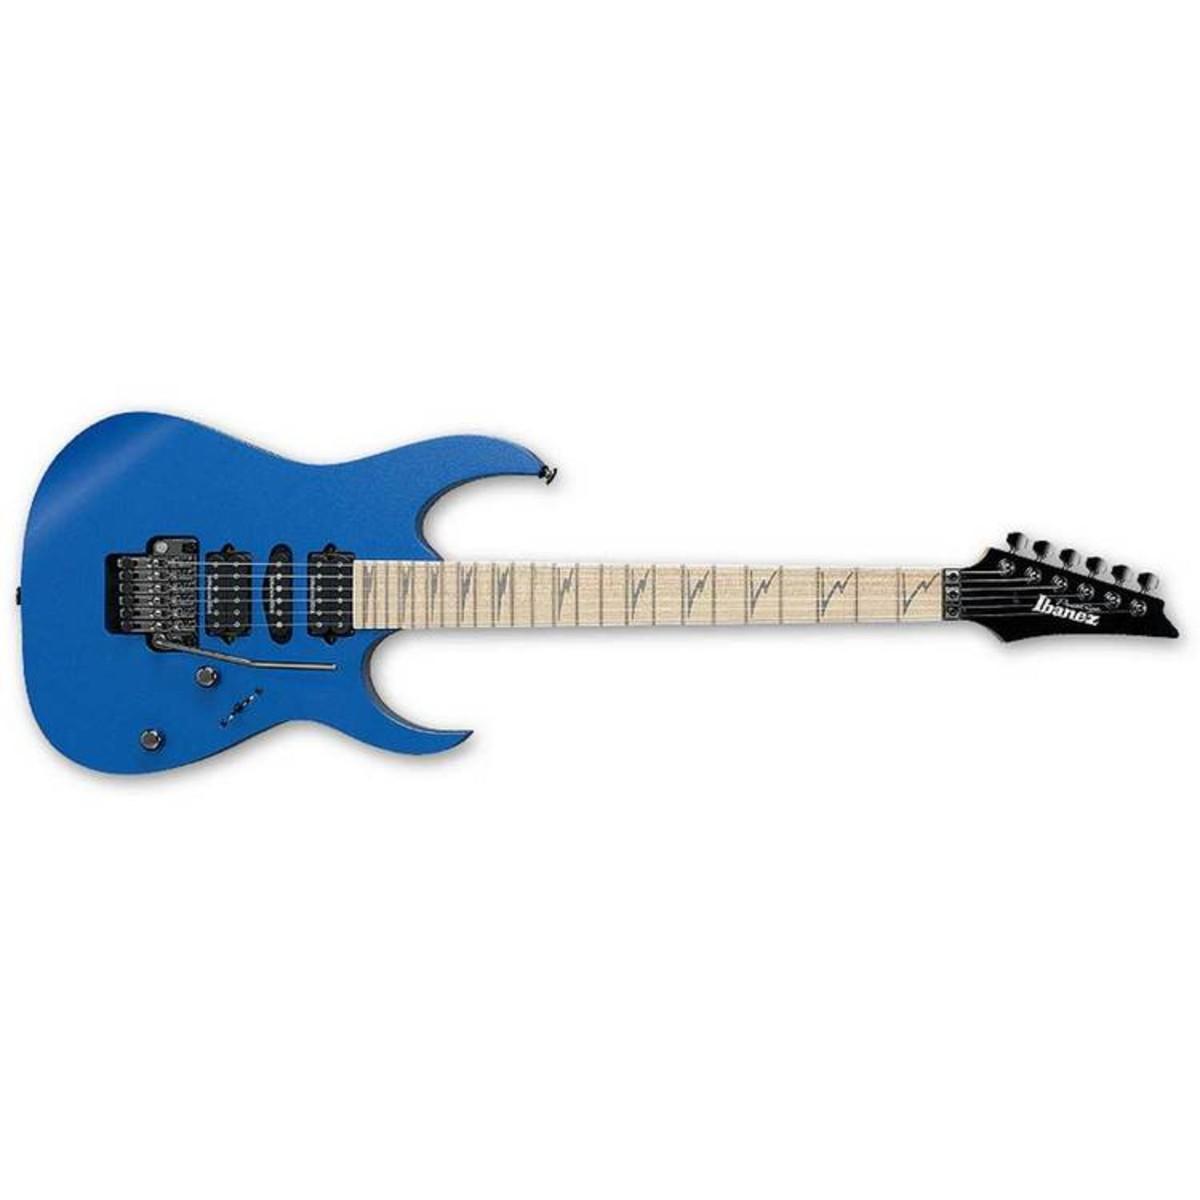 Ibanez RG2570MZ Prestige Electric Guitar, Vital Blue at Gear4music.com